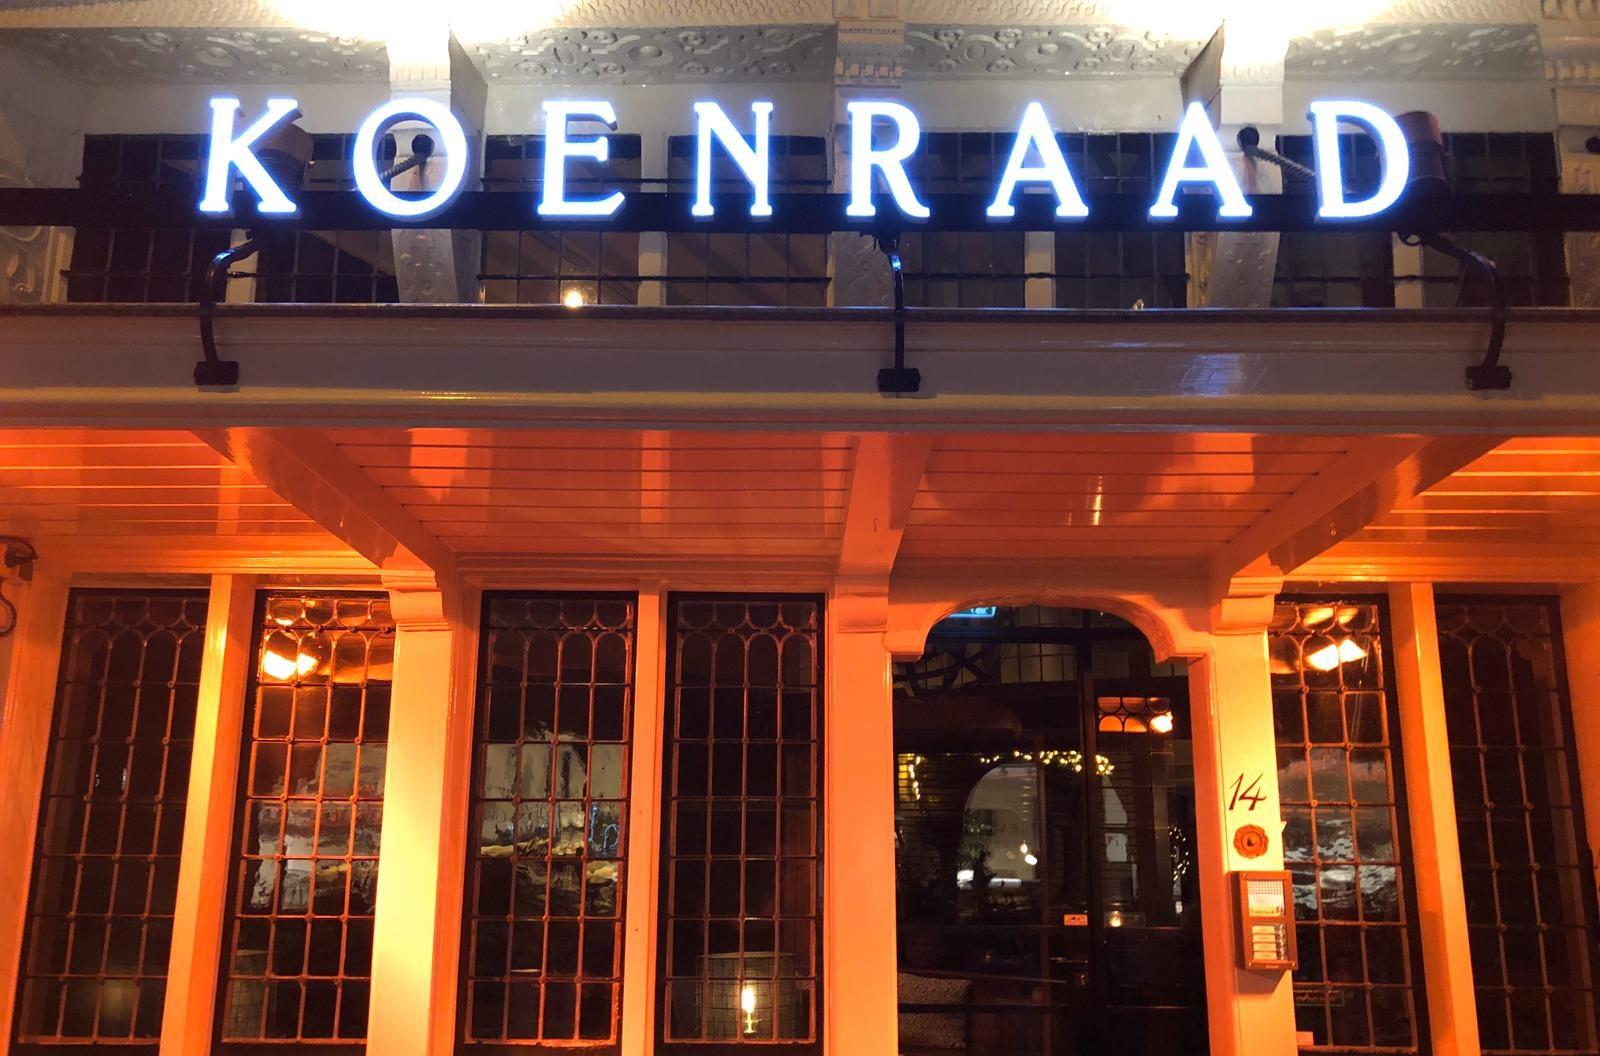 Restaurant Koenraad